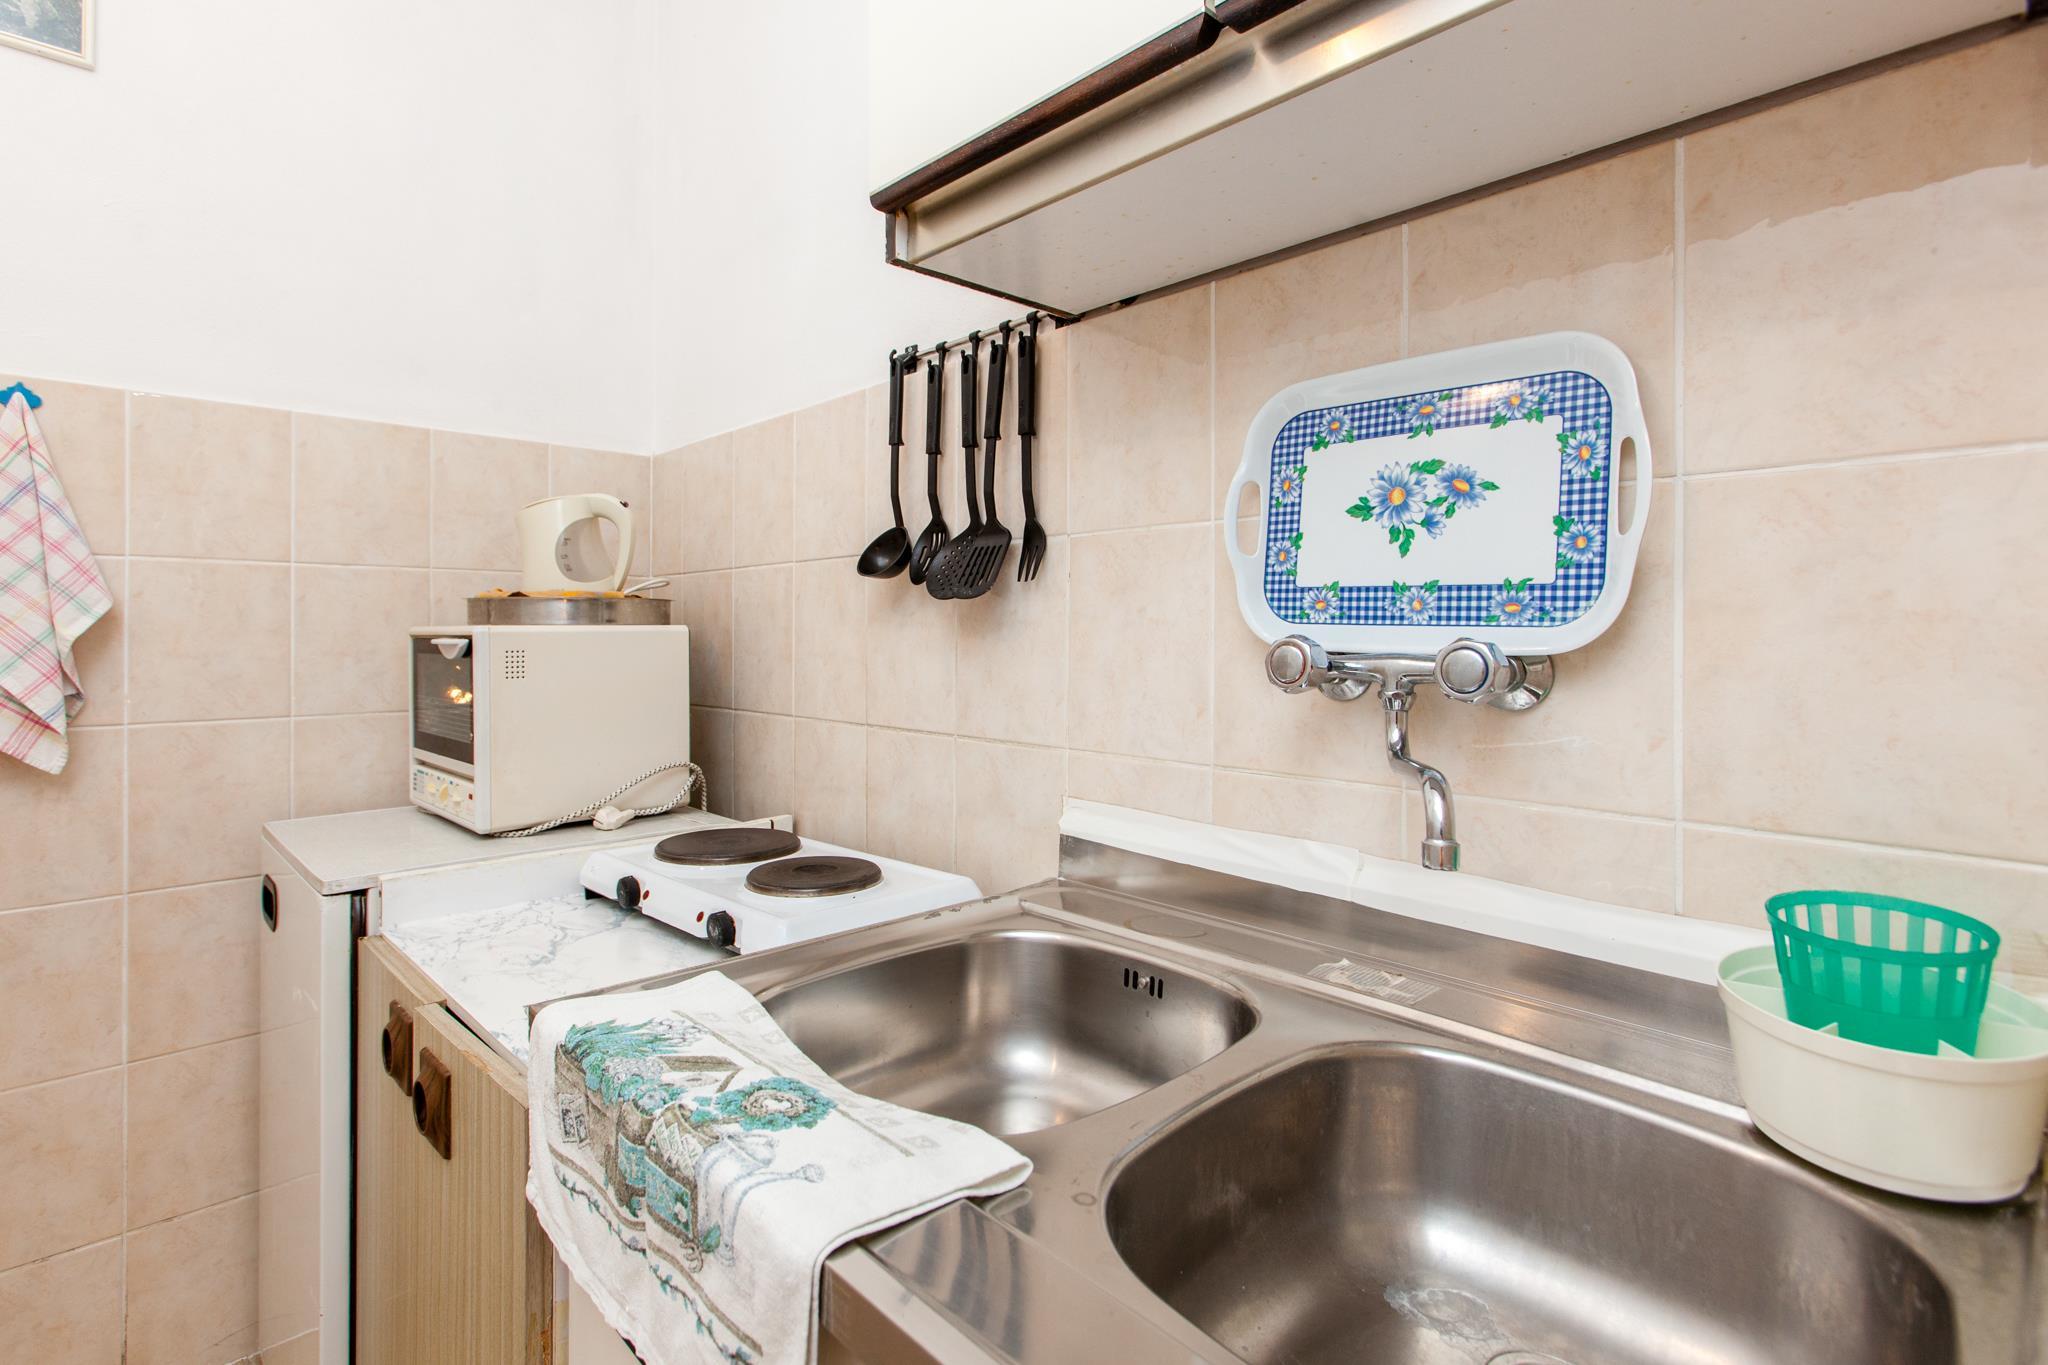 Ferienwohnung Apartments Bla~enka / A3 / One Bedroom (1928327), Lokva Rogoznica, , Dalmatien, Kroatien, Bild 10